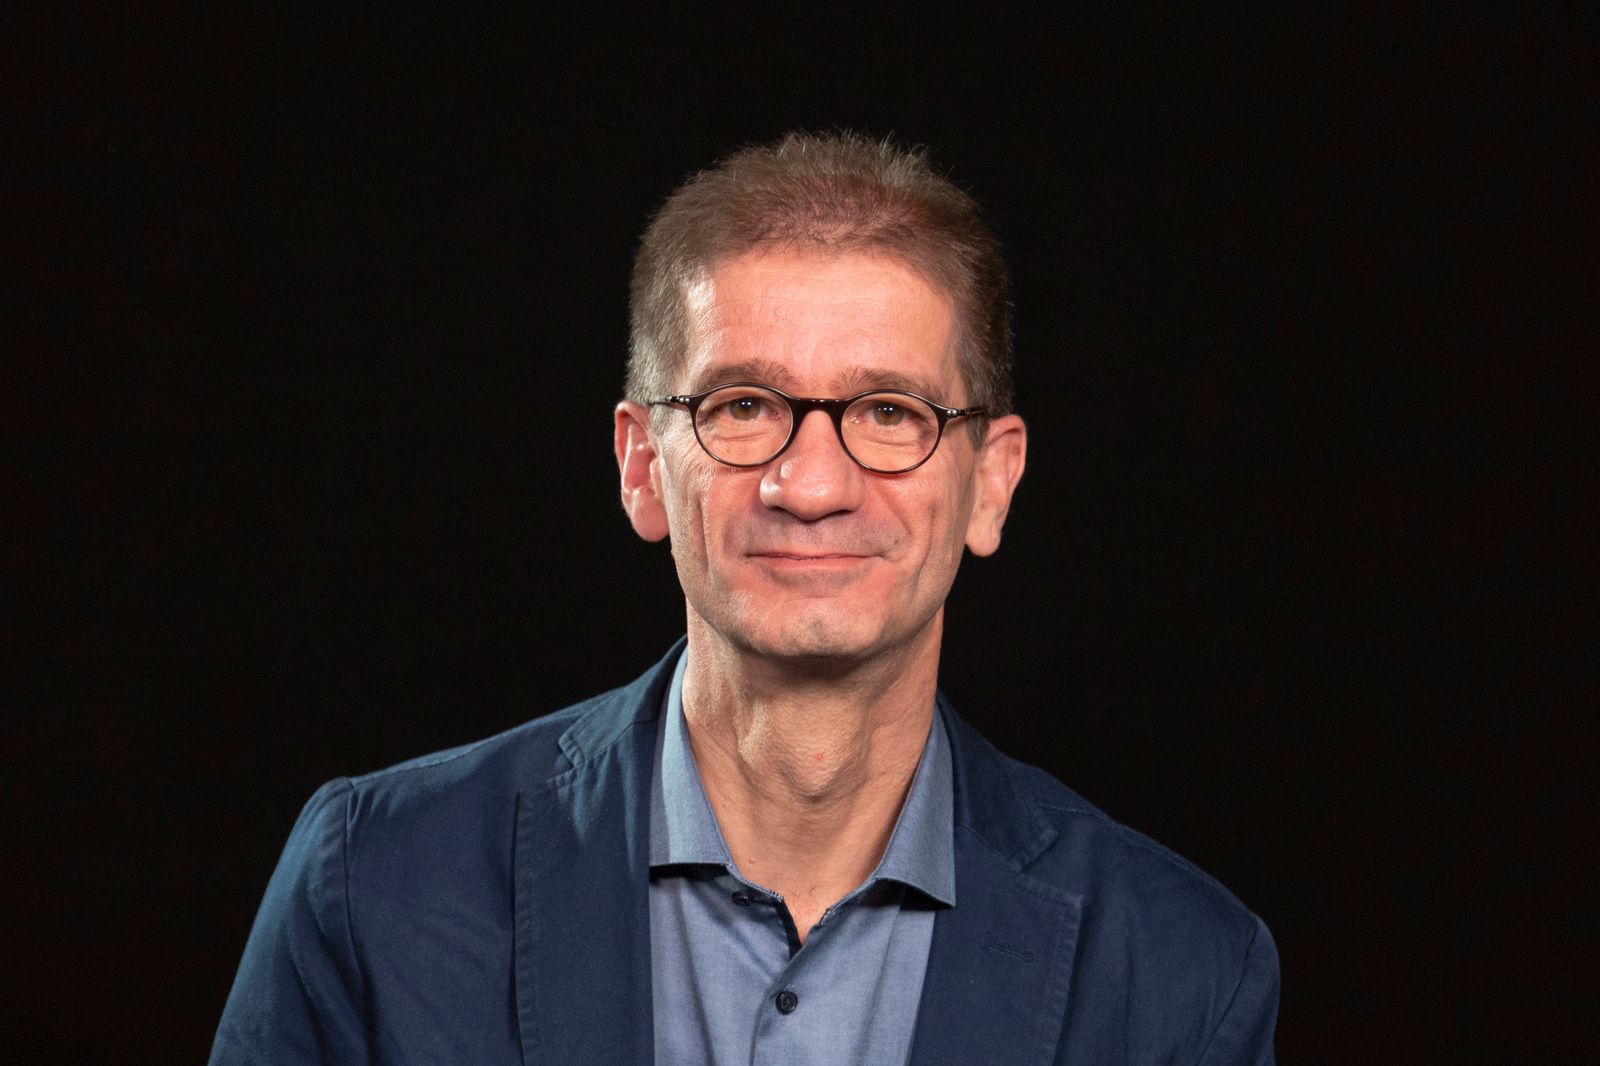 Prof. Thomas Görne